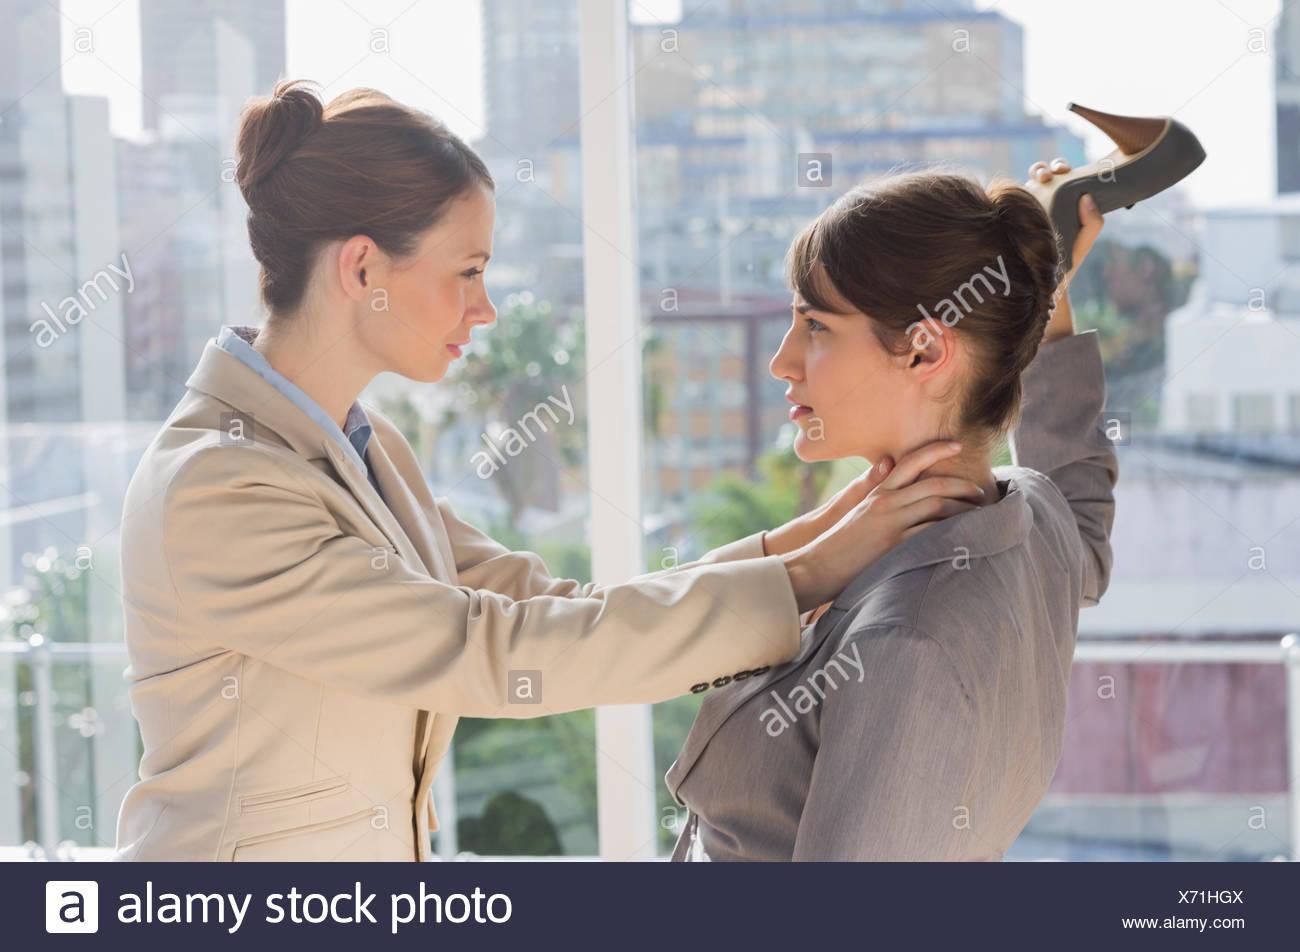 strangling woman stock photos amp strangling woman stock